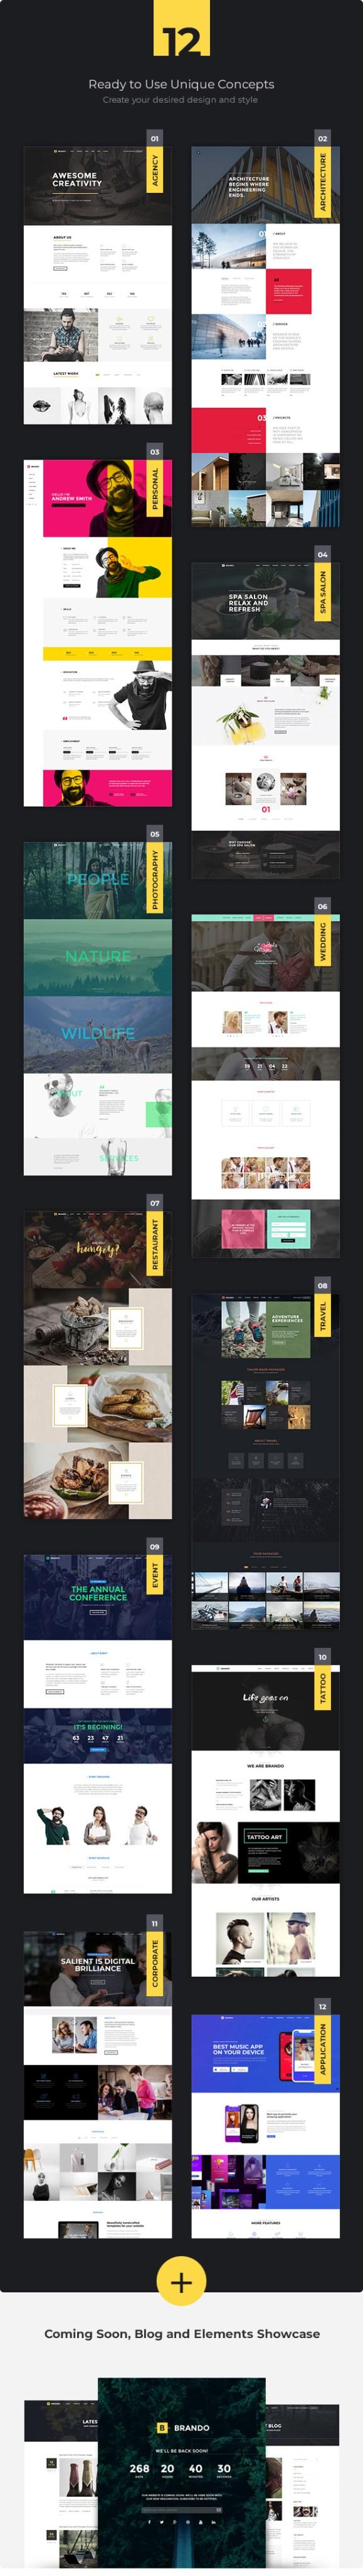 Brando Responsive and Multipurpose OnePage WordPress Theme - 8